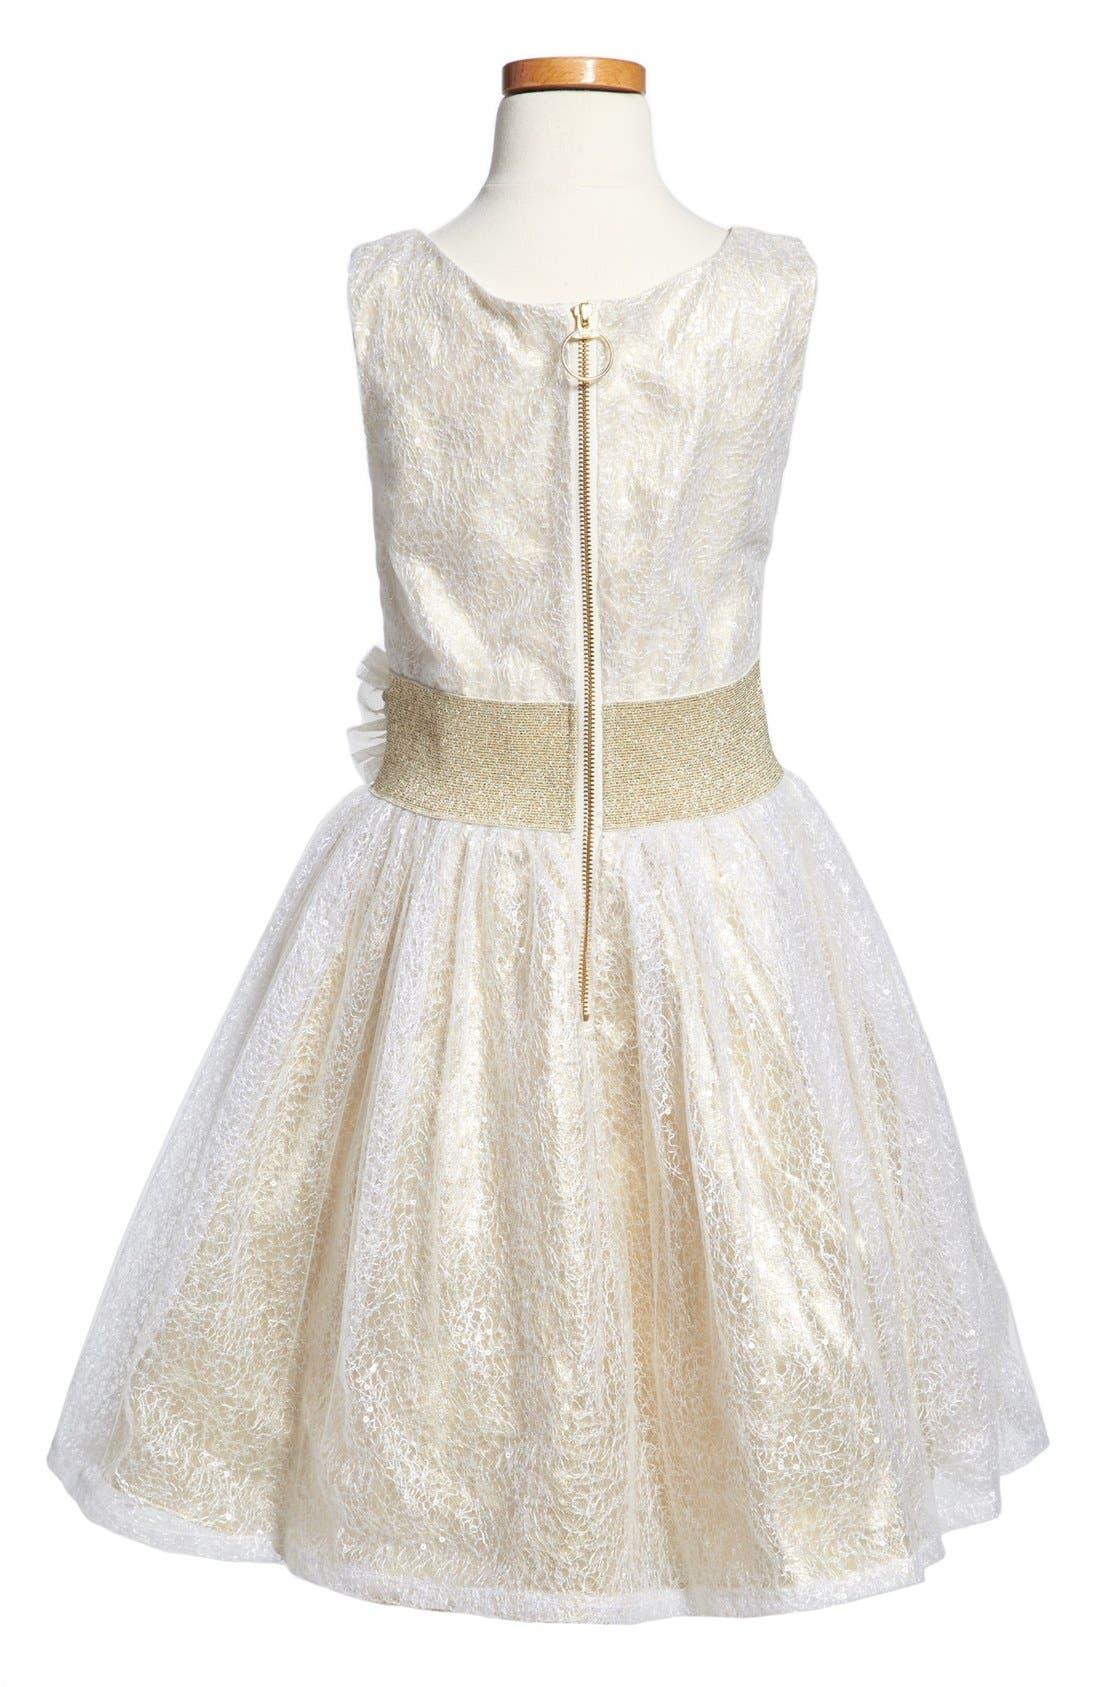 Alternate Image 2  - Zoe Ltd Sleeveless Dress (Big Girls)